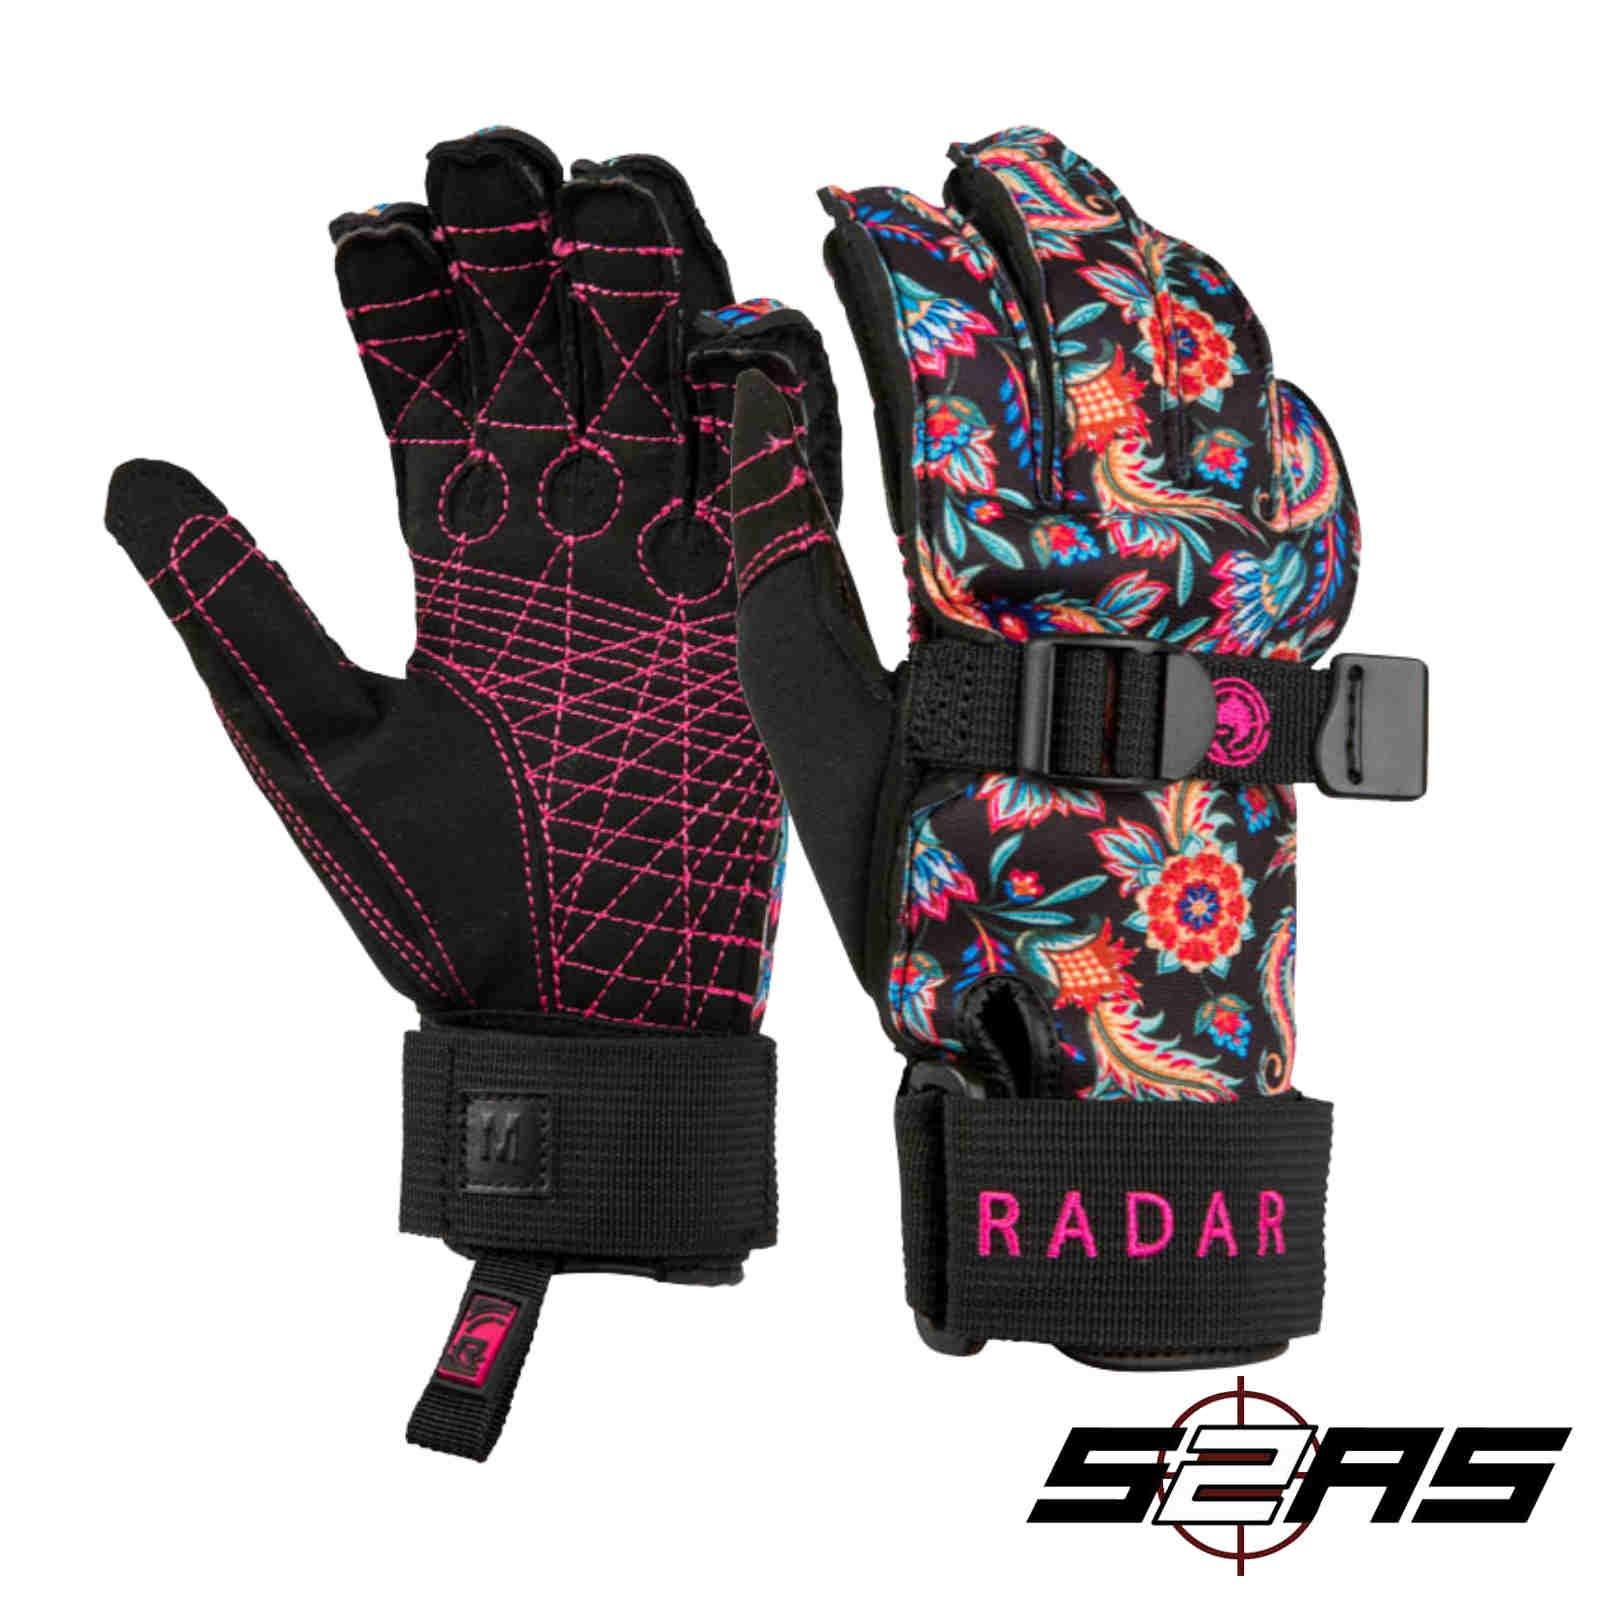 Radar Lyric Inside-Out Waterski Glove Black (Xs) by Radar